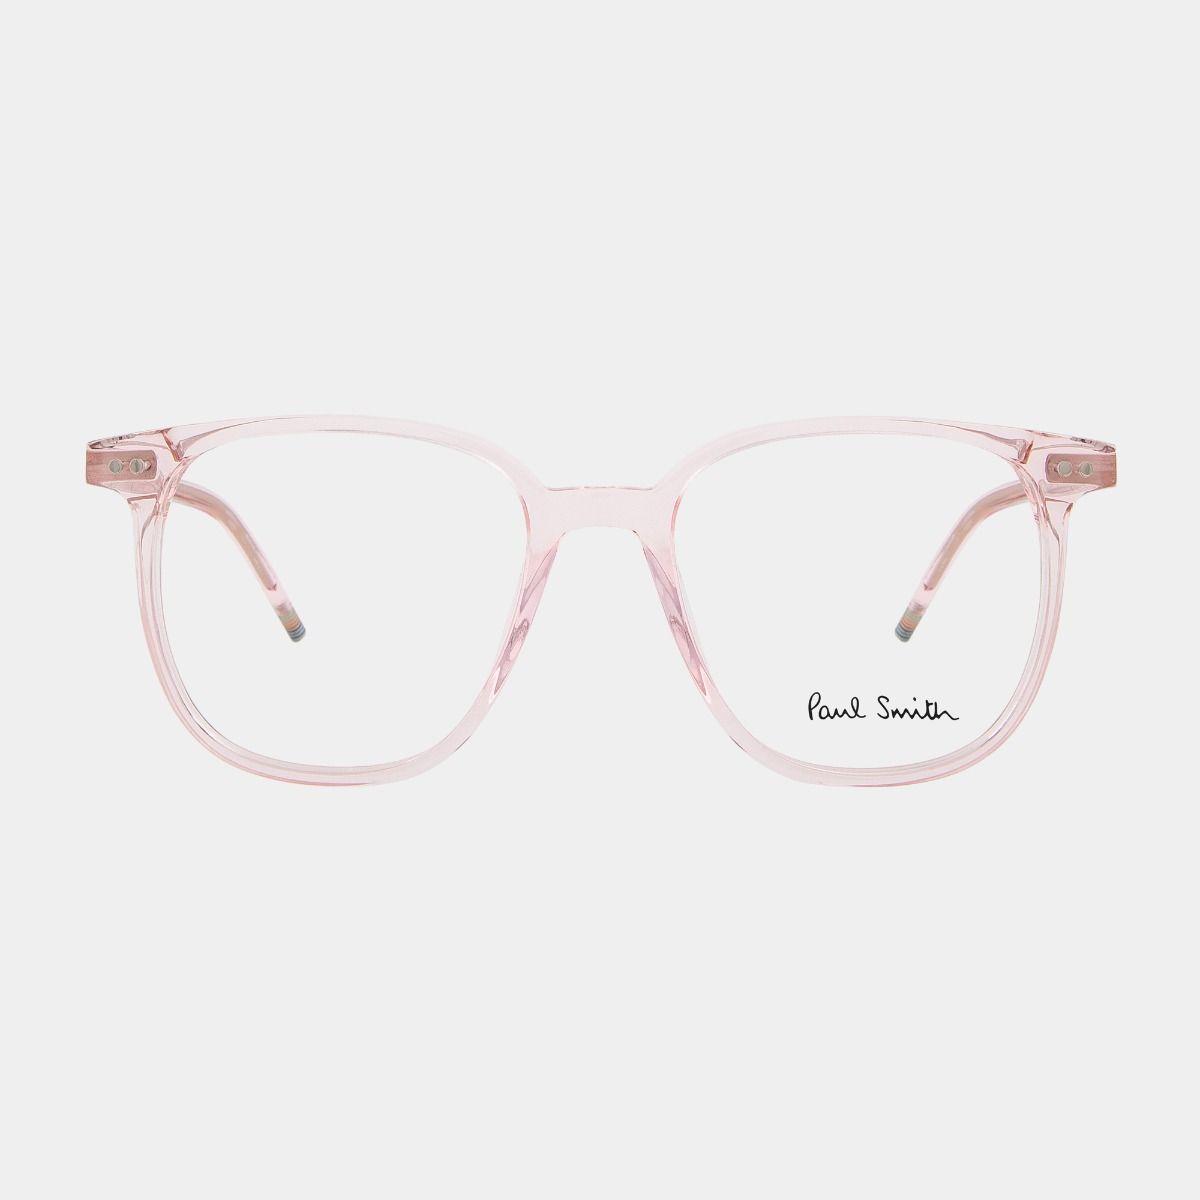 Paul Smith Catford Optical Cat-Eye Glasses